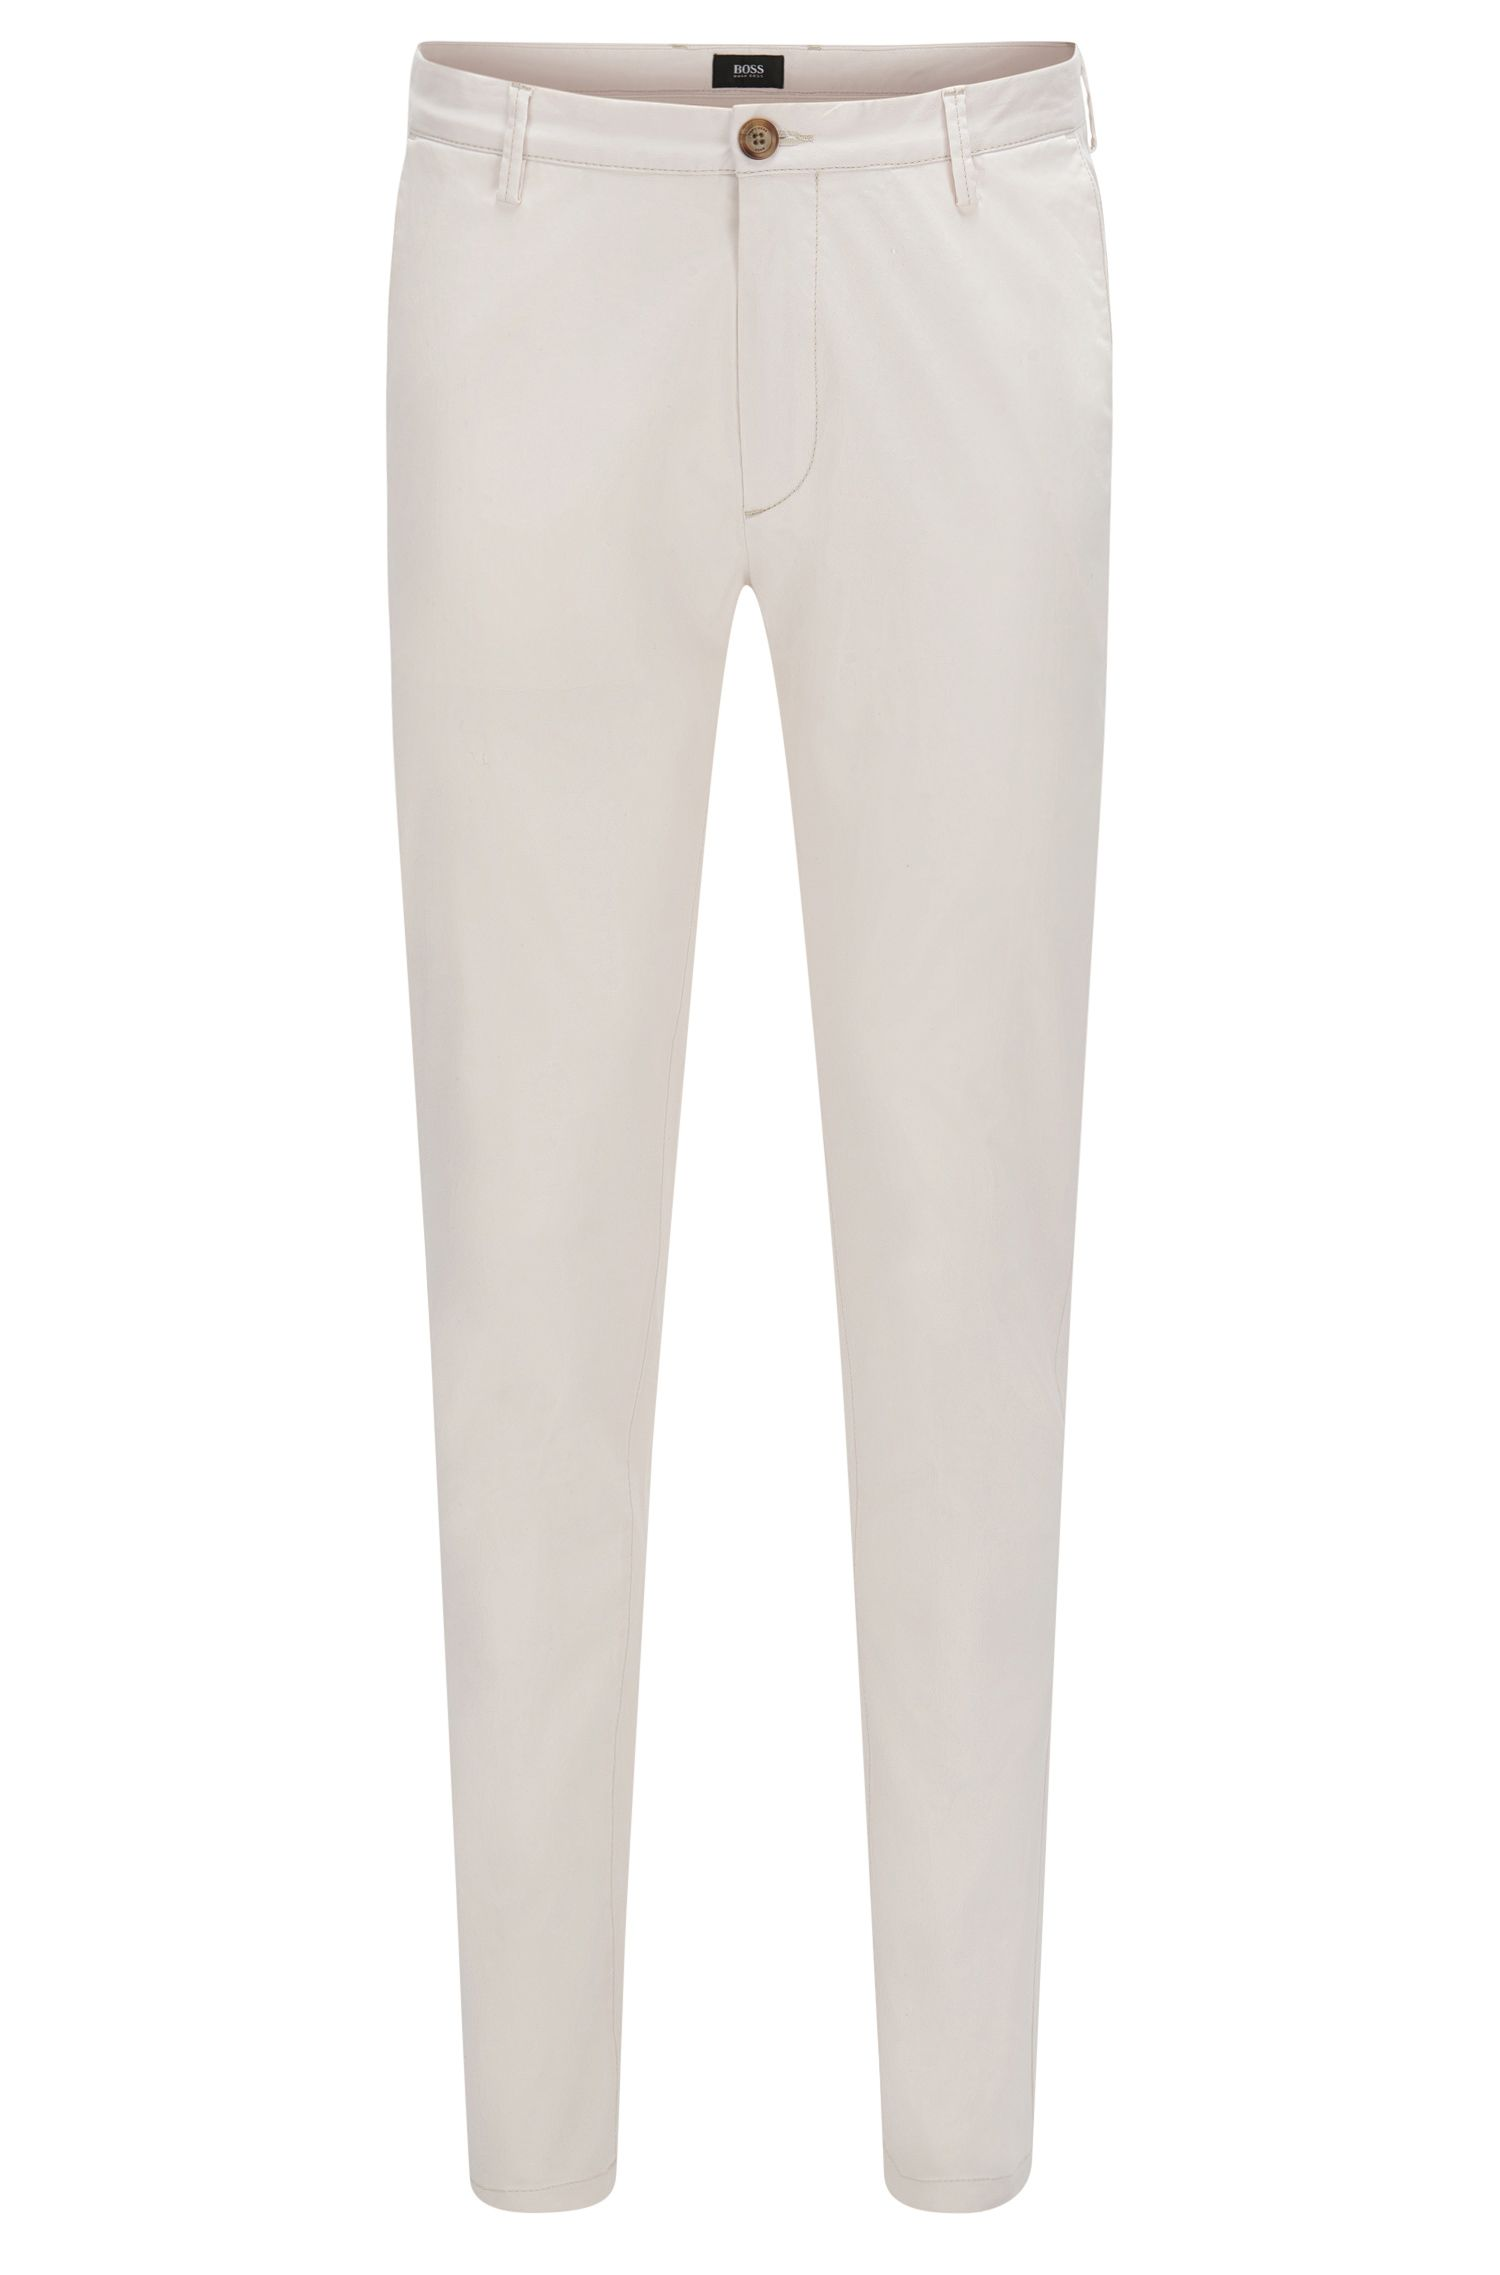 'Rice W'   Slim Fit, Italian Stretch Cotton Pants